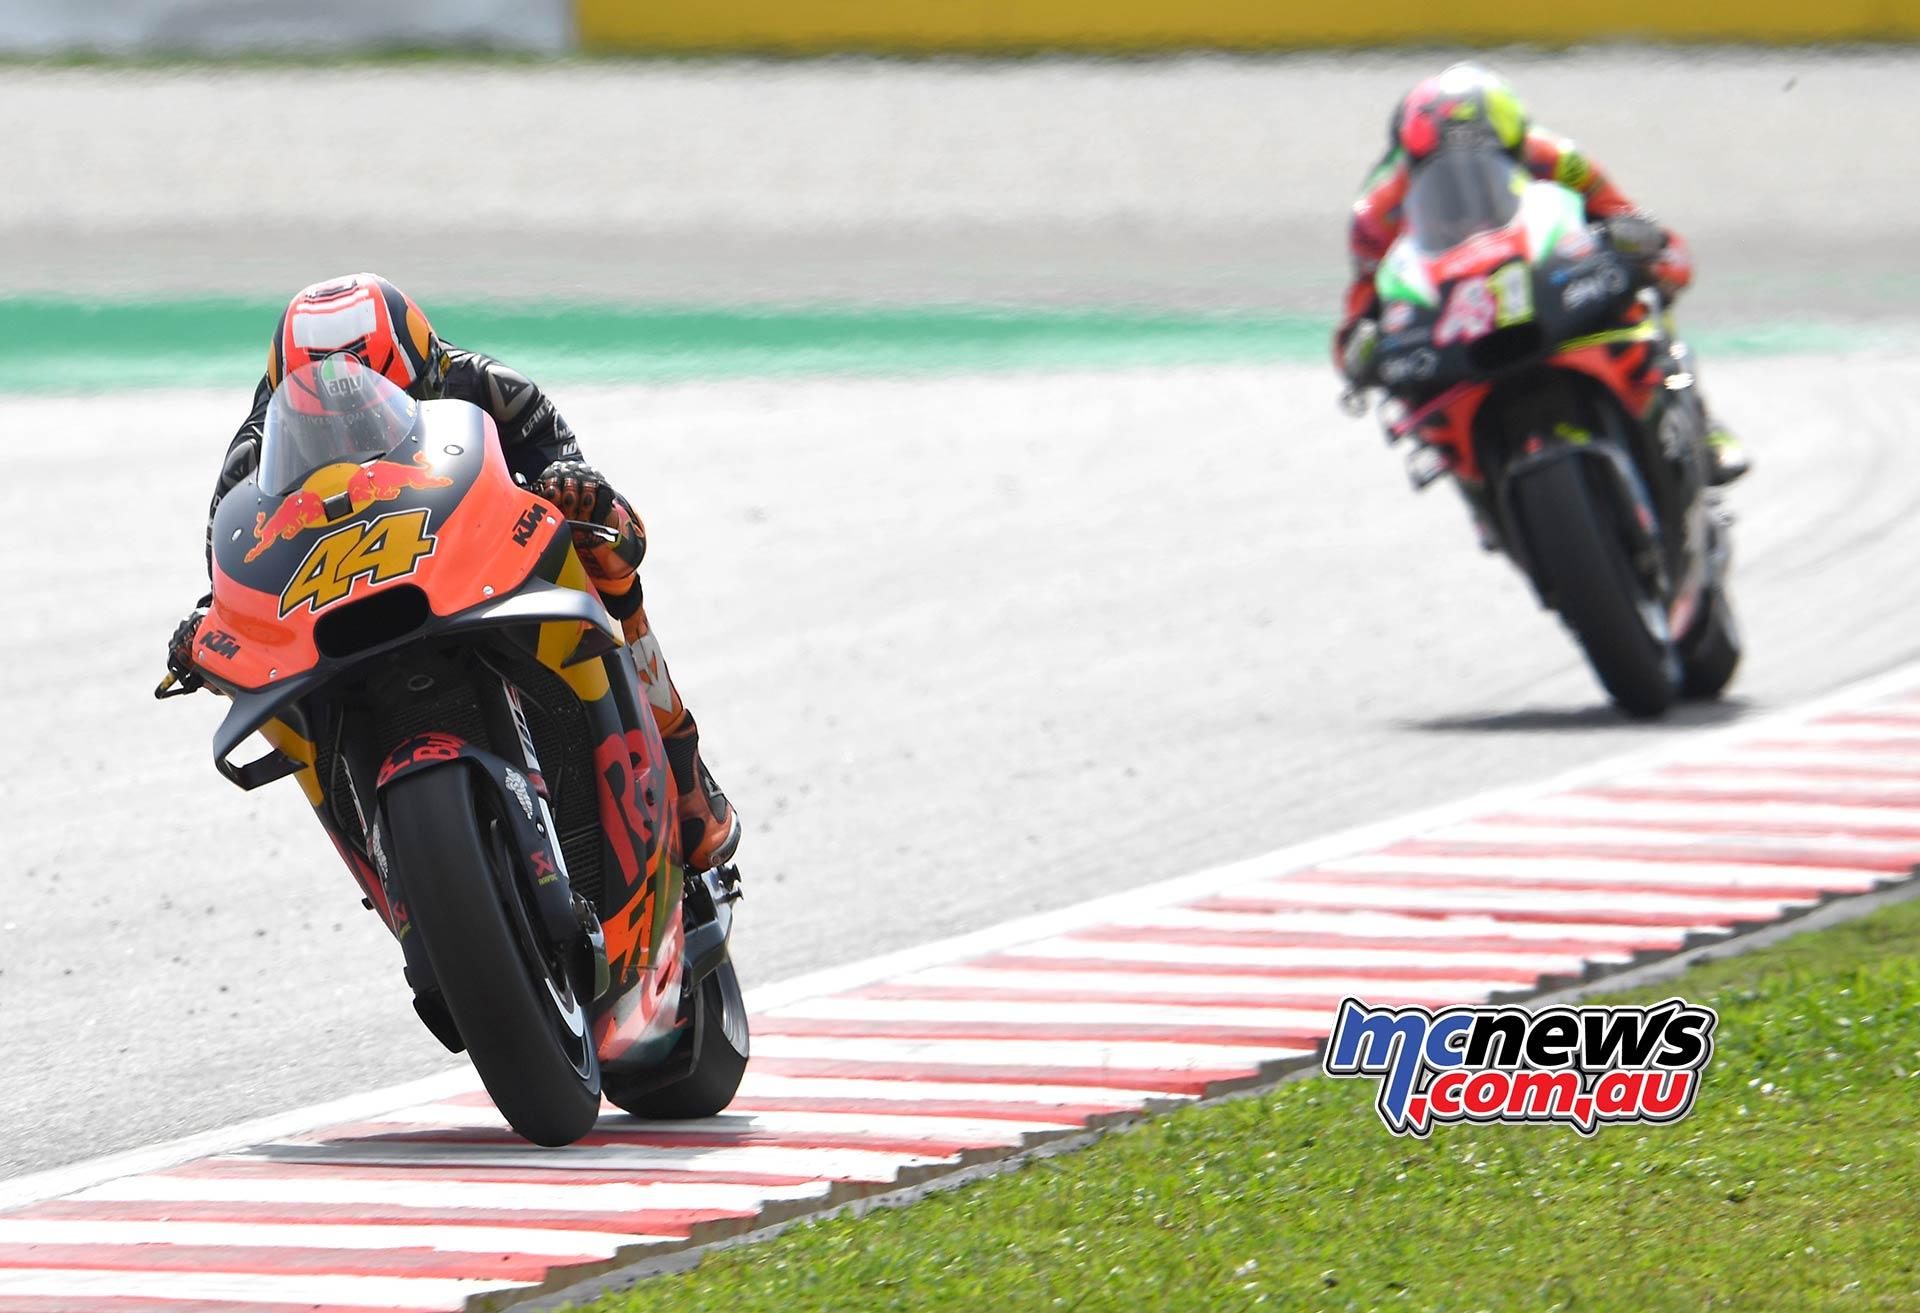 MotoGP Rnd Malaysia Pol Espargaro Aleix